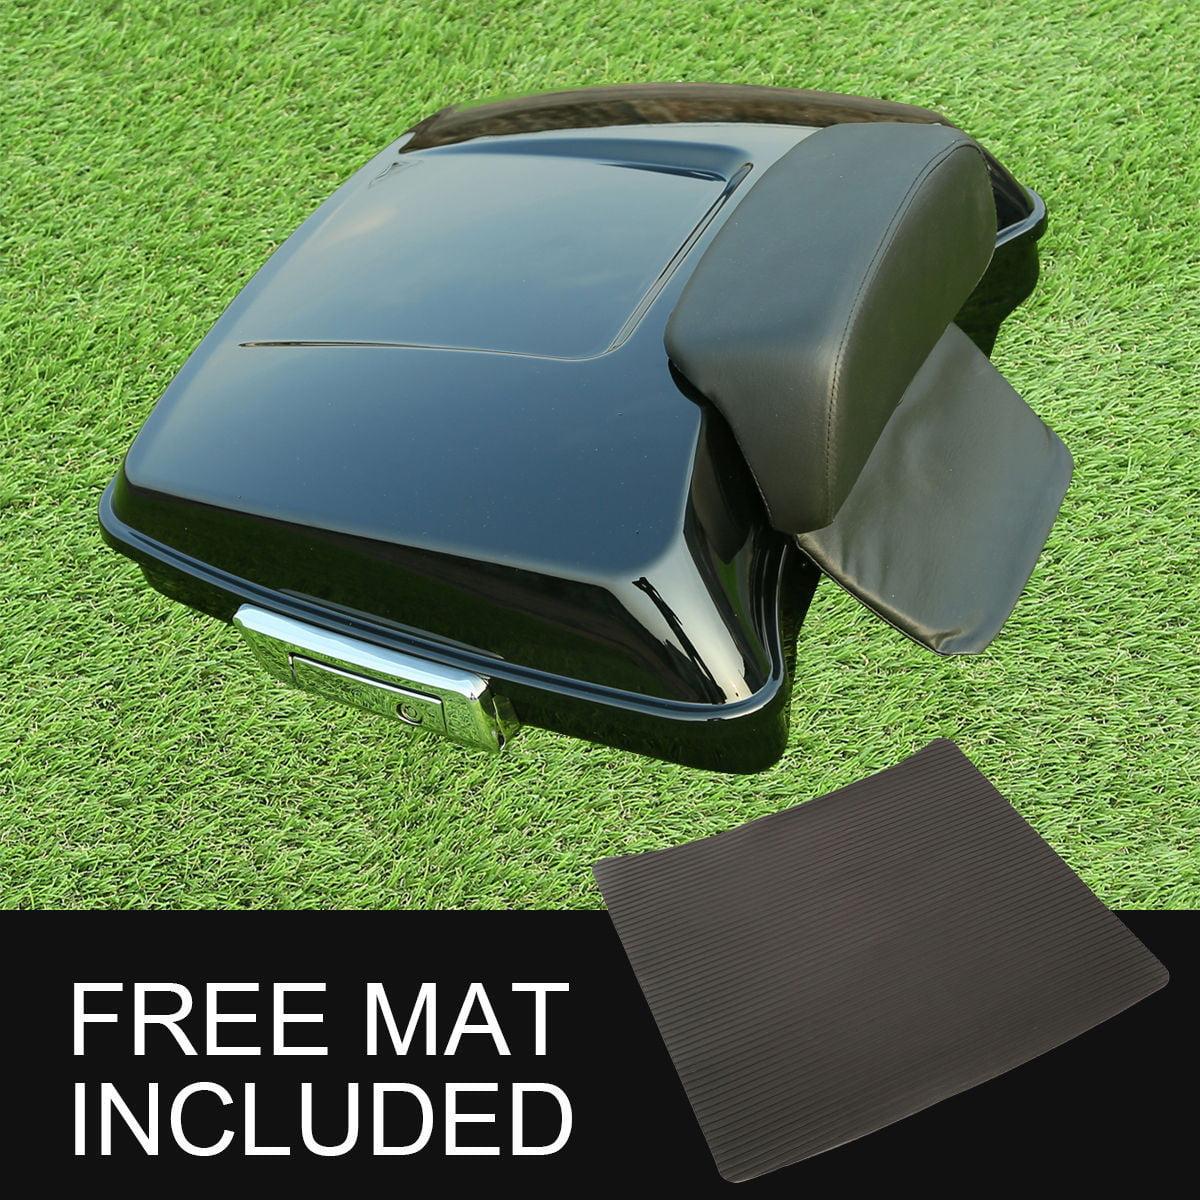 TCMT Matt Black Chopped Tour Pack Trunk W//Backrest Fits For Harley Street Road Glide 2014-2020 Style B